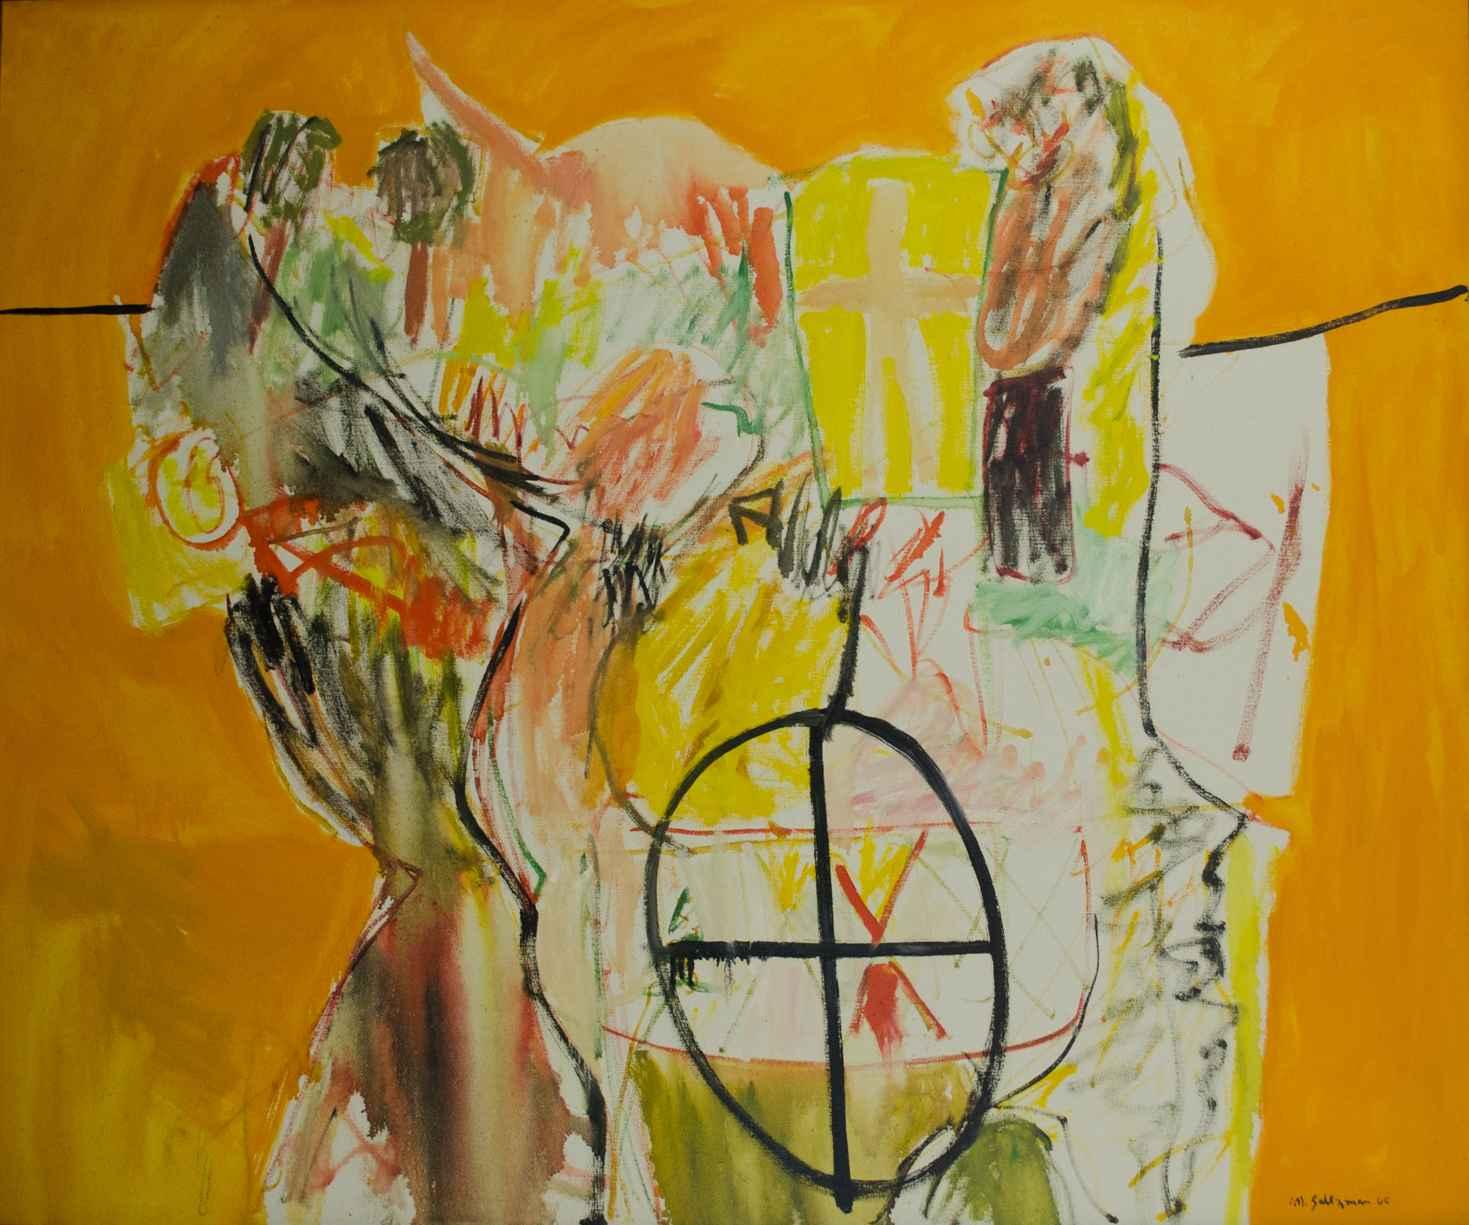 EASTERN OREGON TARGET... by  Marvin Saltzman - Masterpiece Online